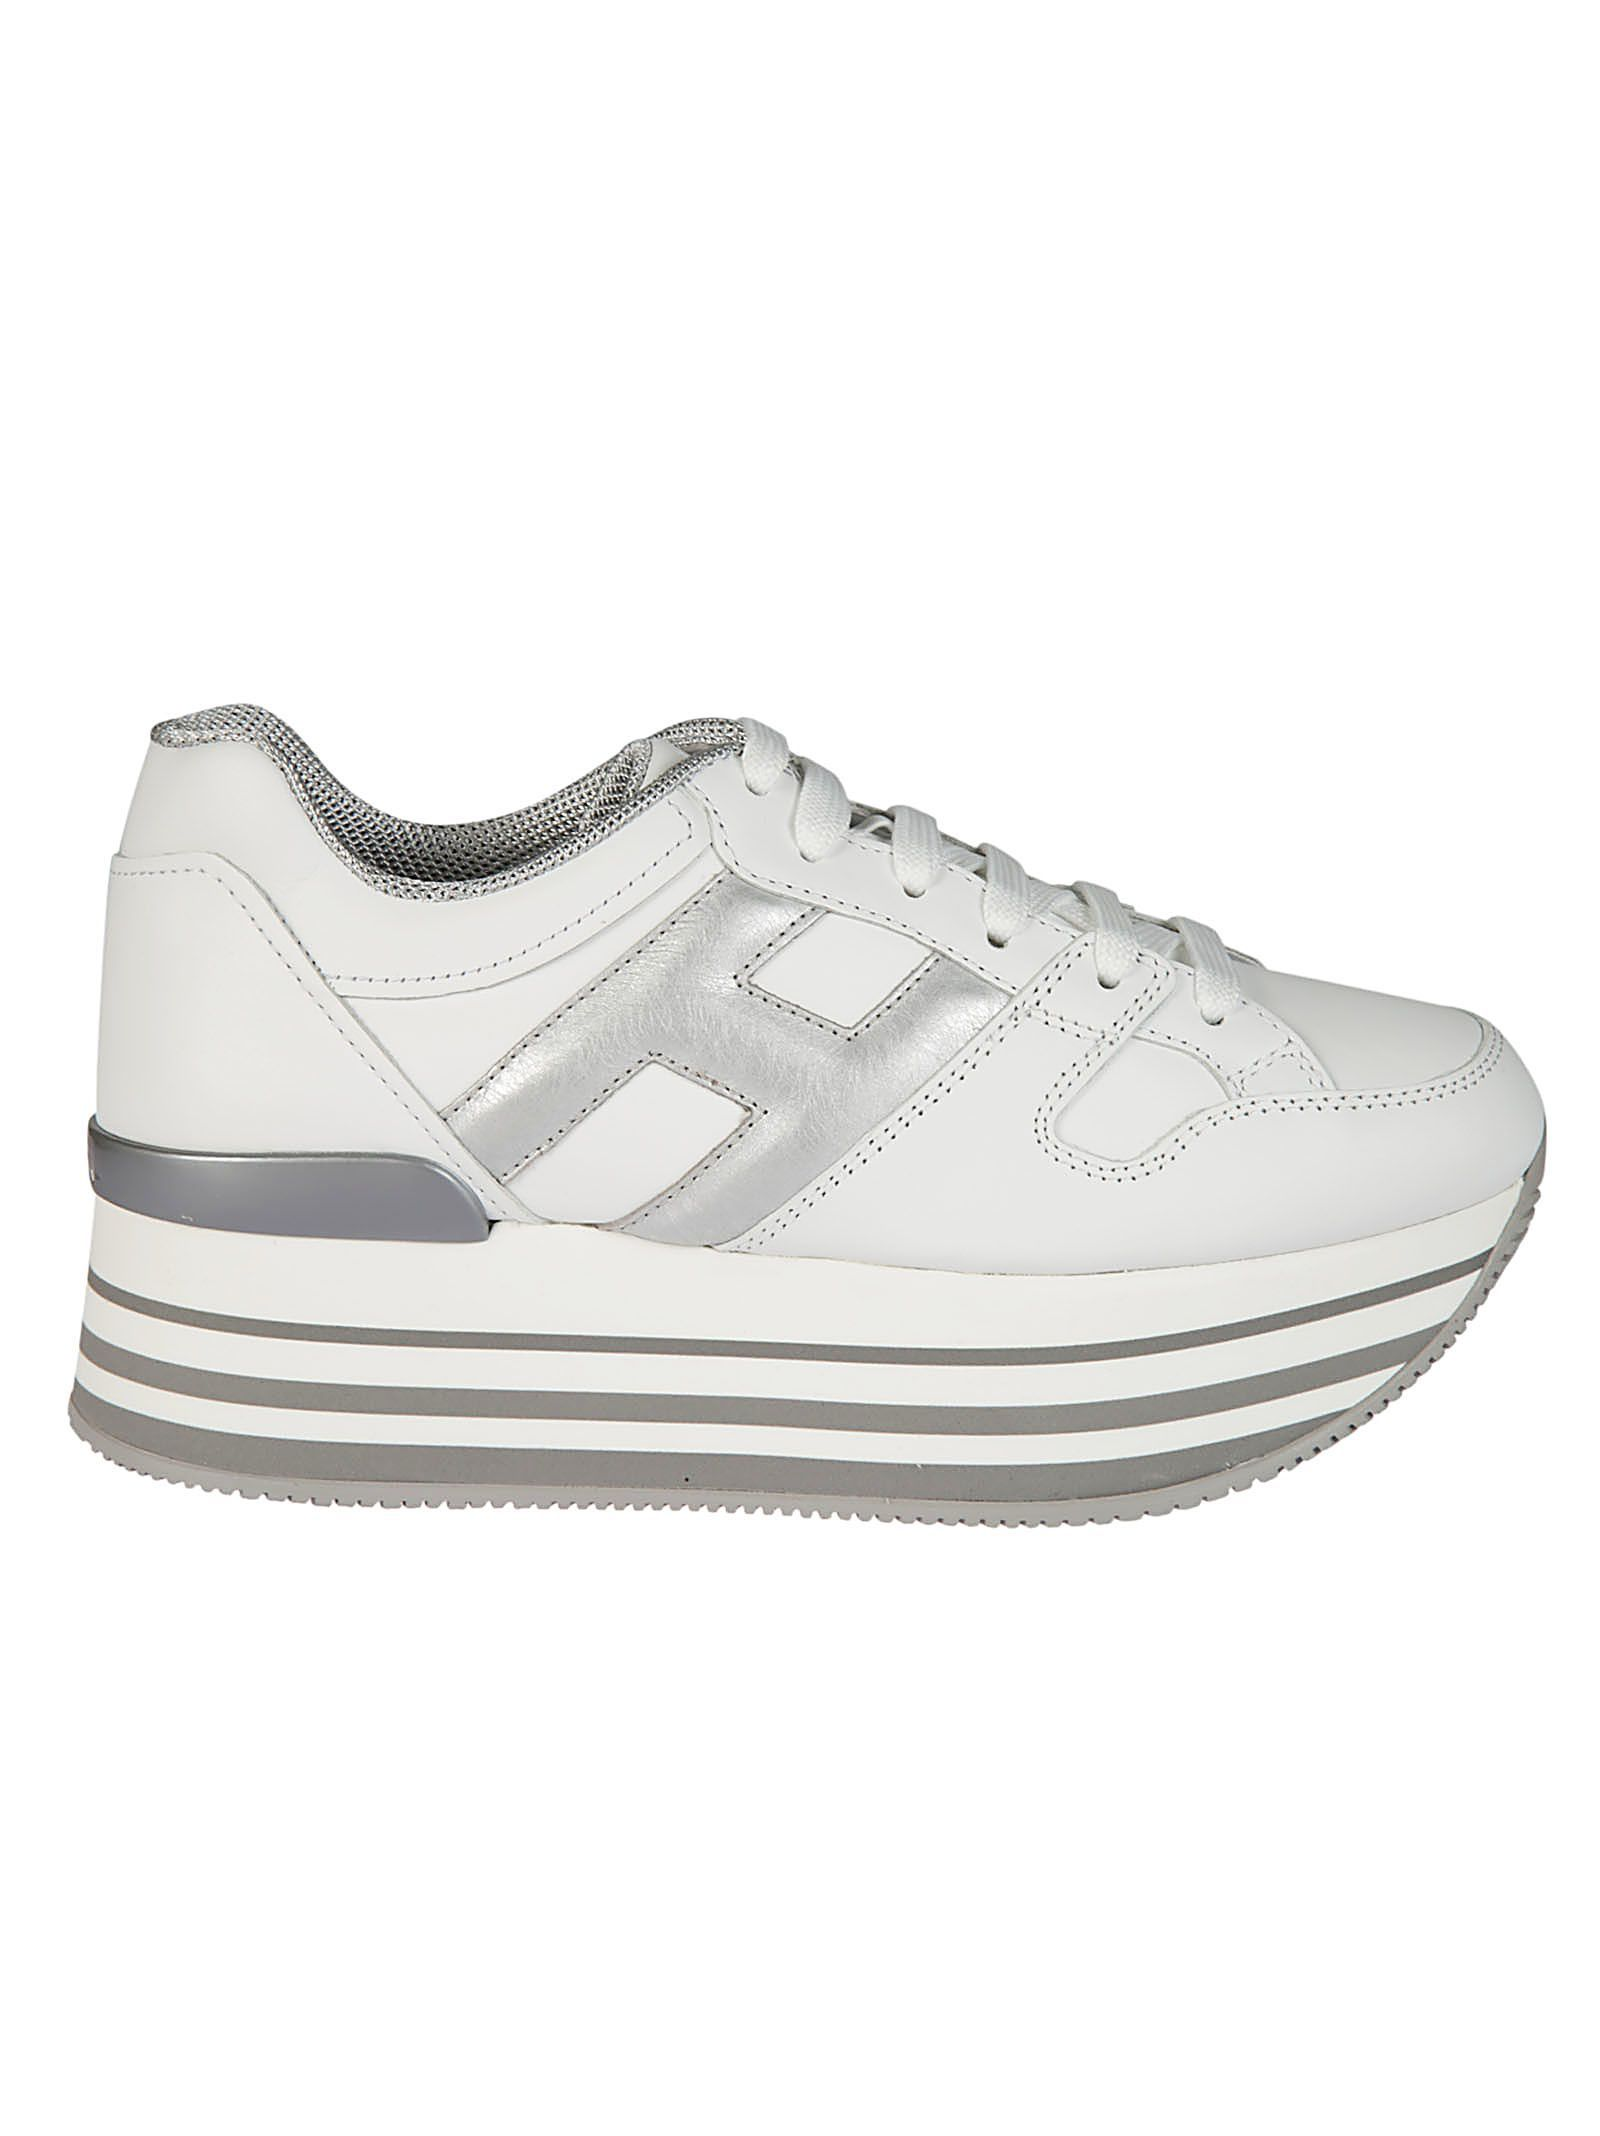 logo platform sneakers - White Hogan gFLLZm